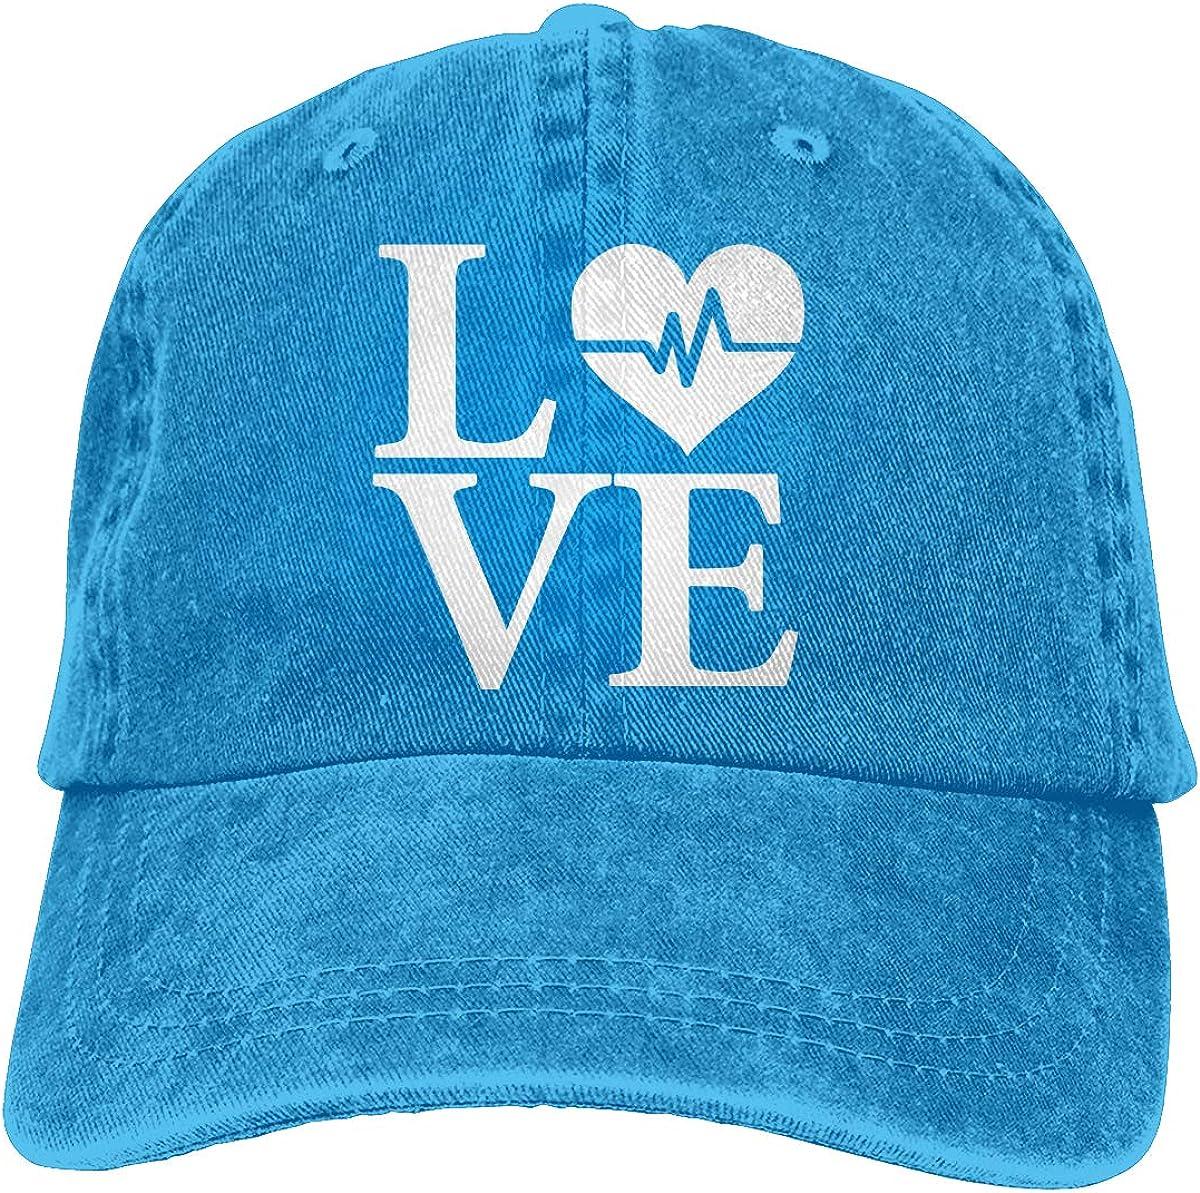 Love Heart 1 Unisex Personalize Cowboy Sun Hat Adjustable Baseball Cap